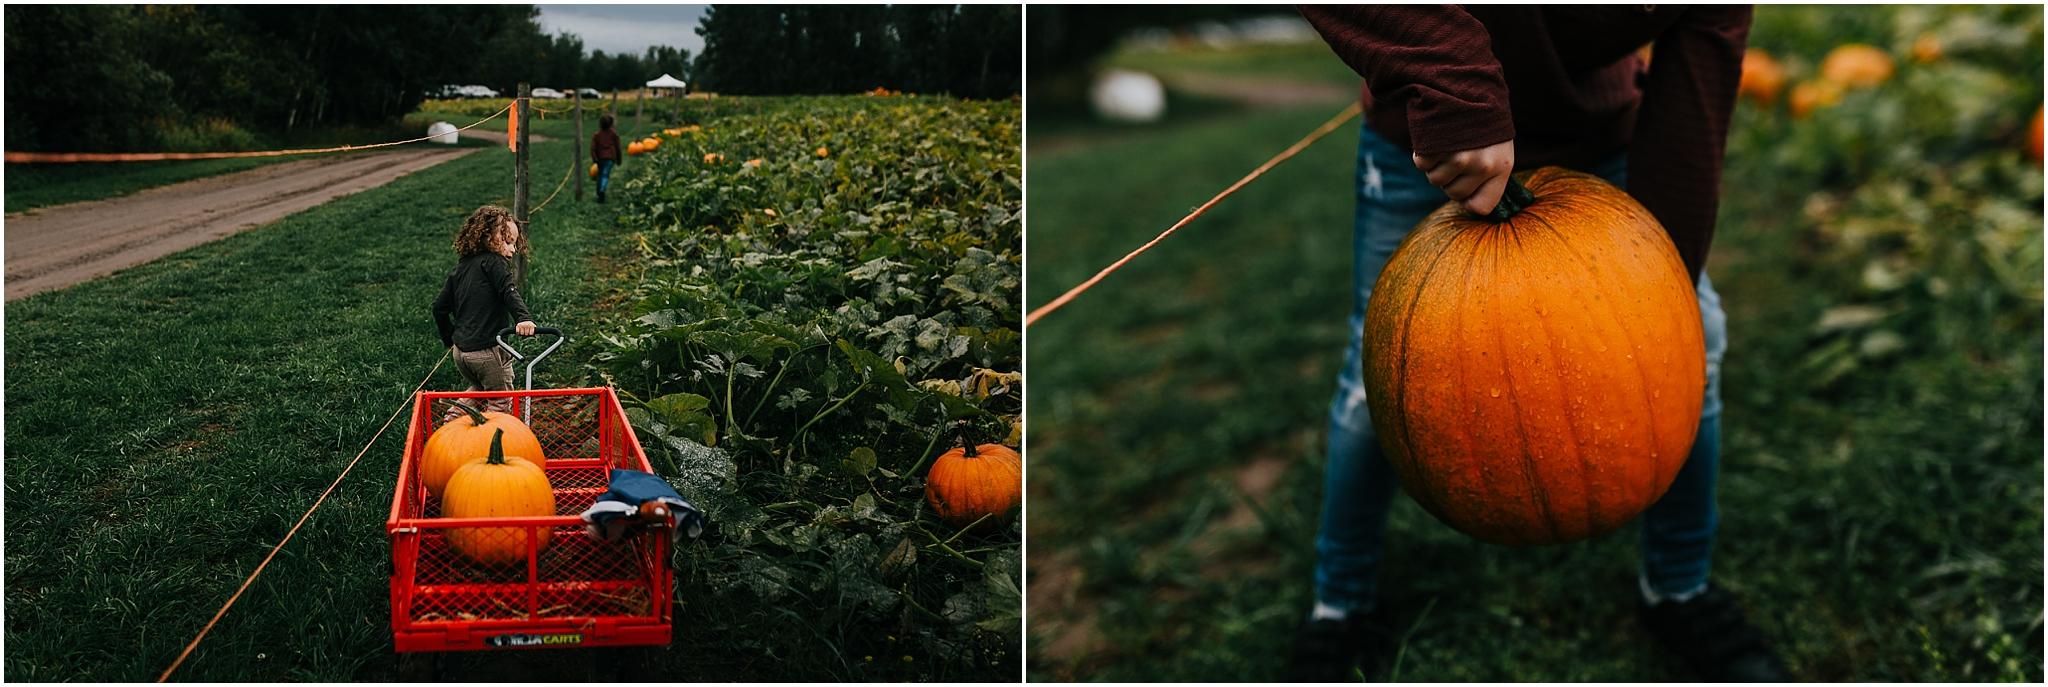 Edmonton Fall Activities Pumpkin Picking u-Pick - Treelines Photography - Edmonton Lifestyle Photographer